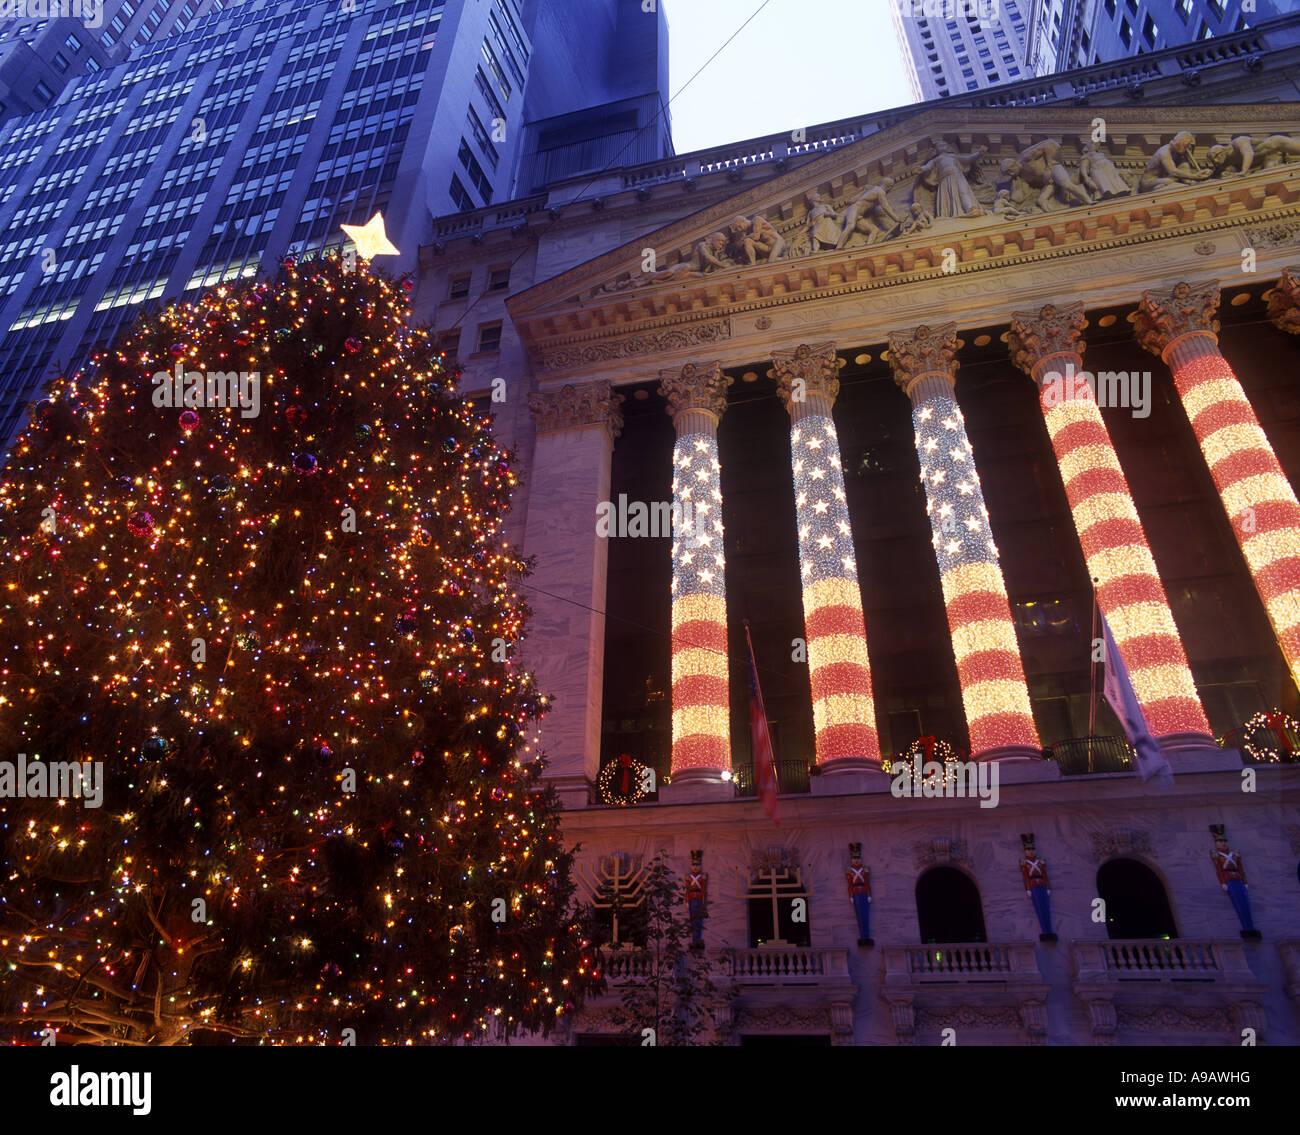 CHRISTMAS TREE LIGHTS WALL STREET STOCK EXCHANGE BUILDING DOWNTOWN